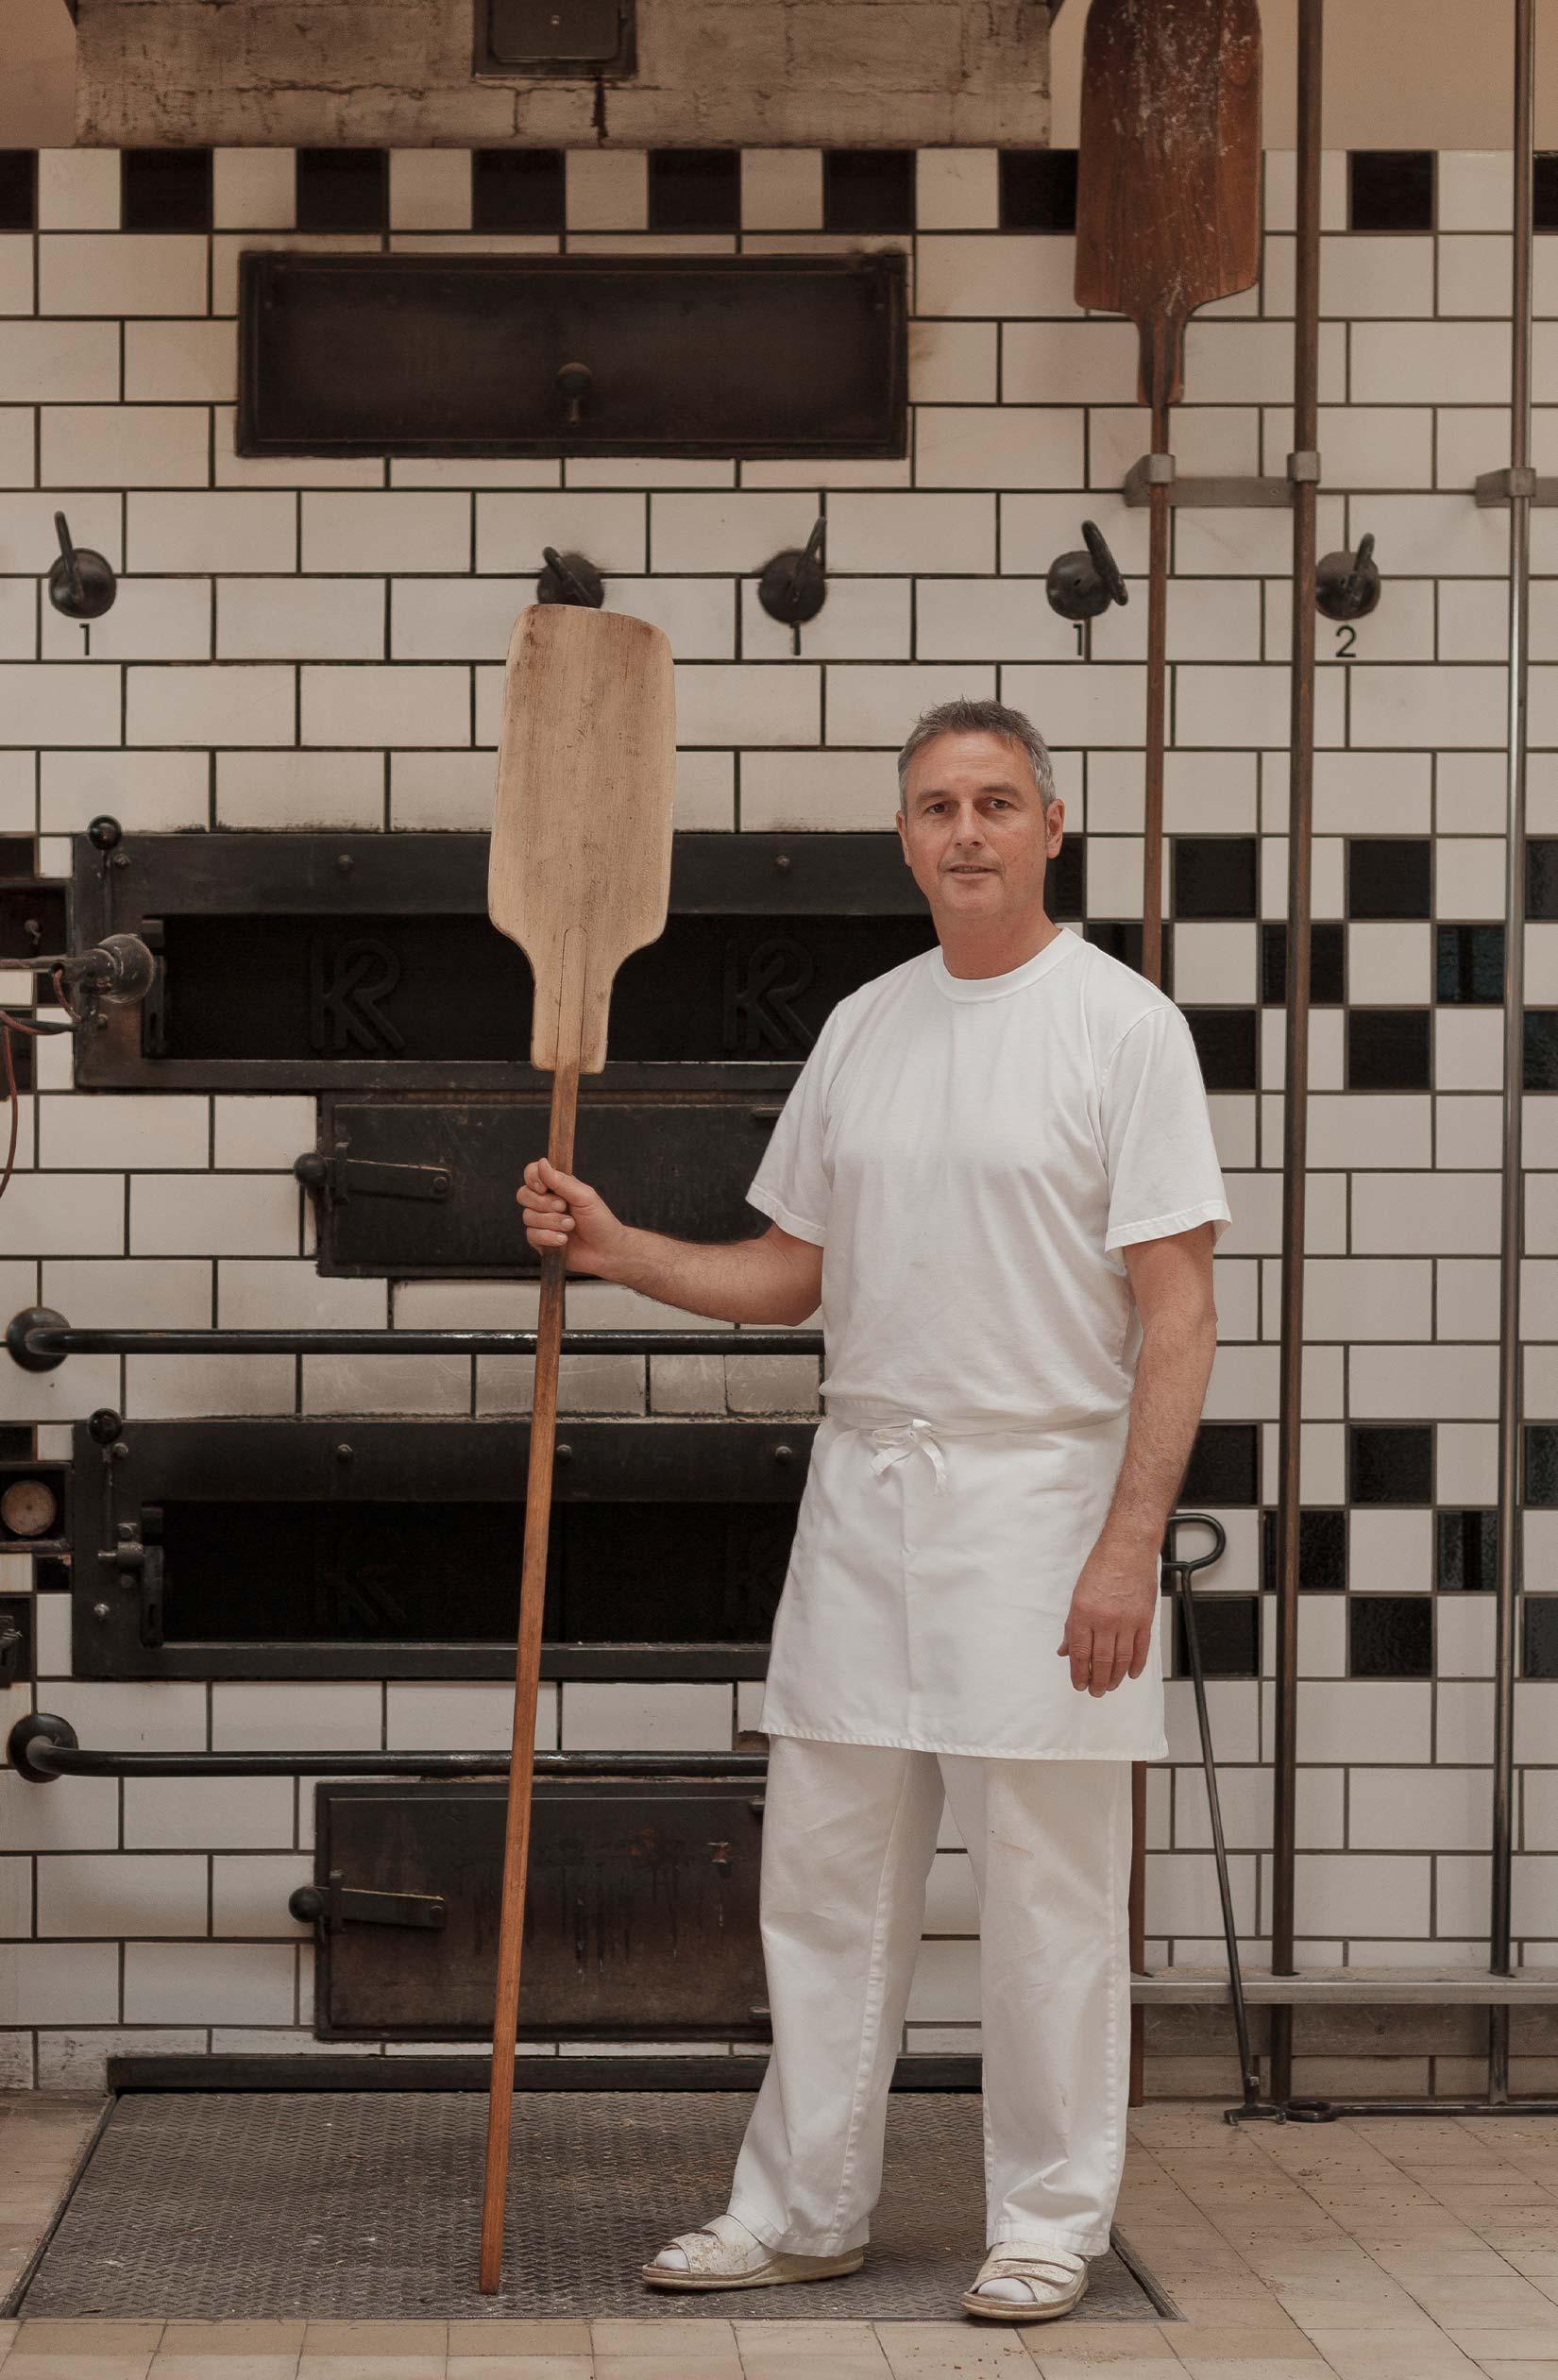 Thomas Schütz am Holzofen für das Urhalmer Holzofenbrot